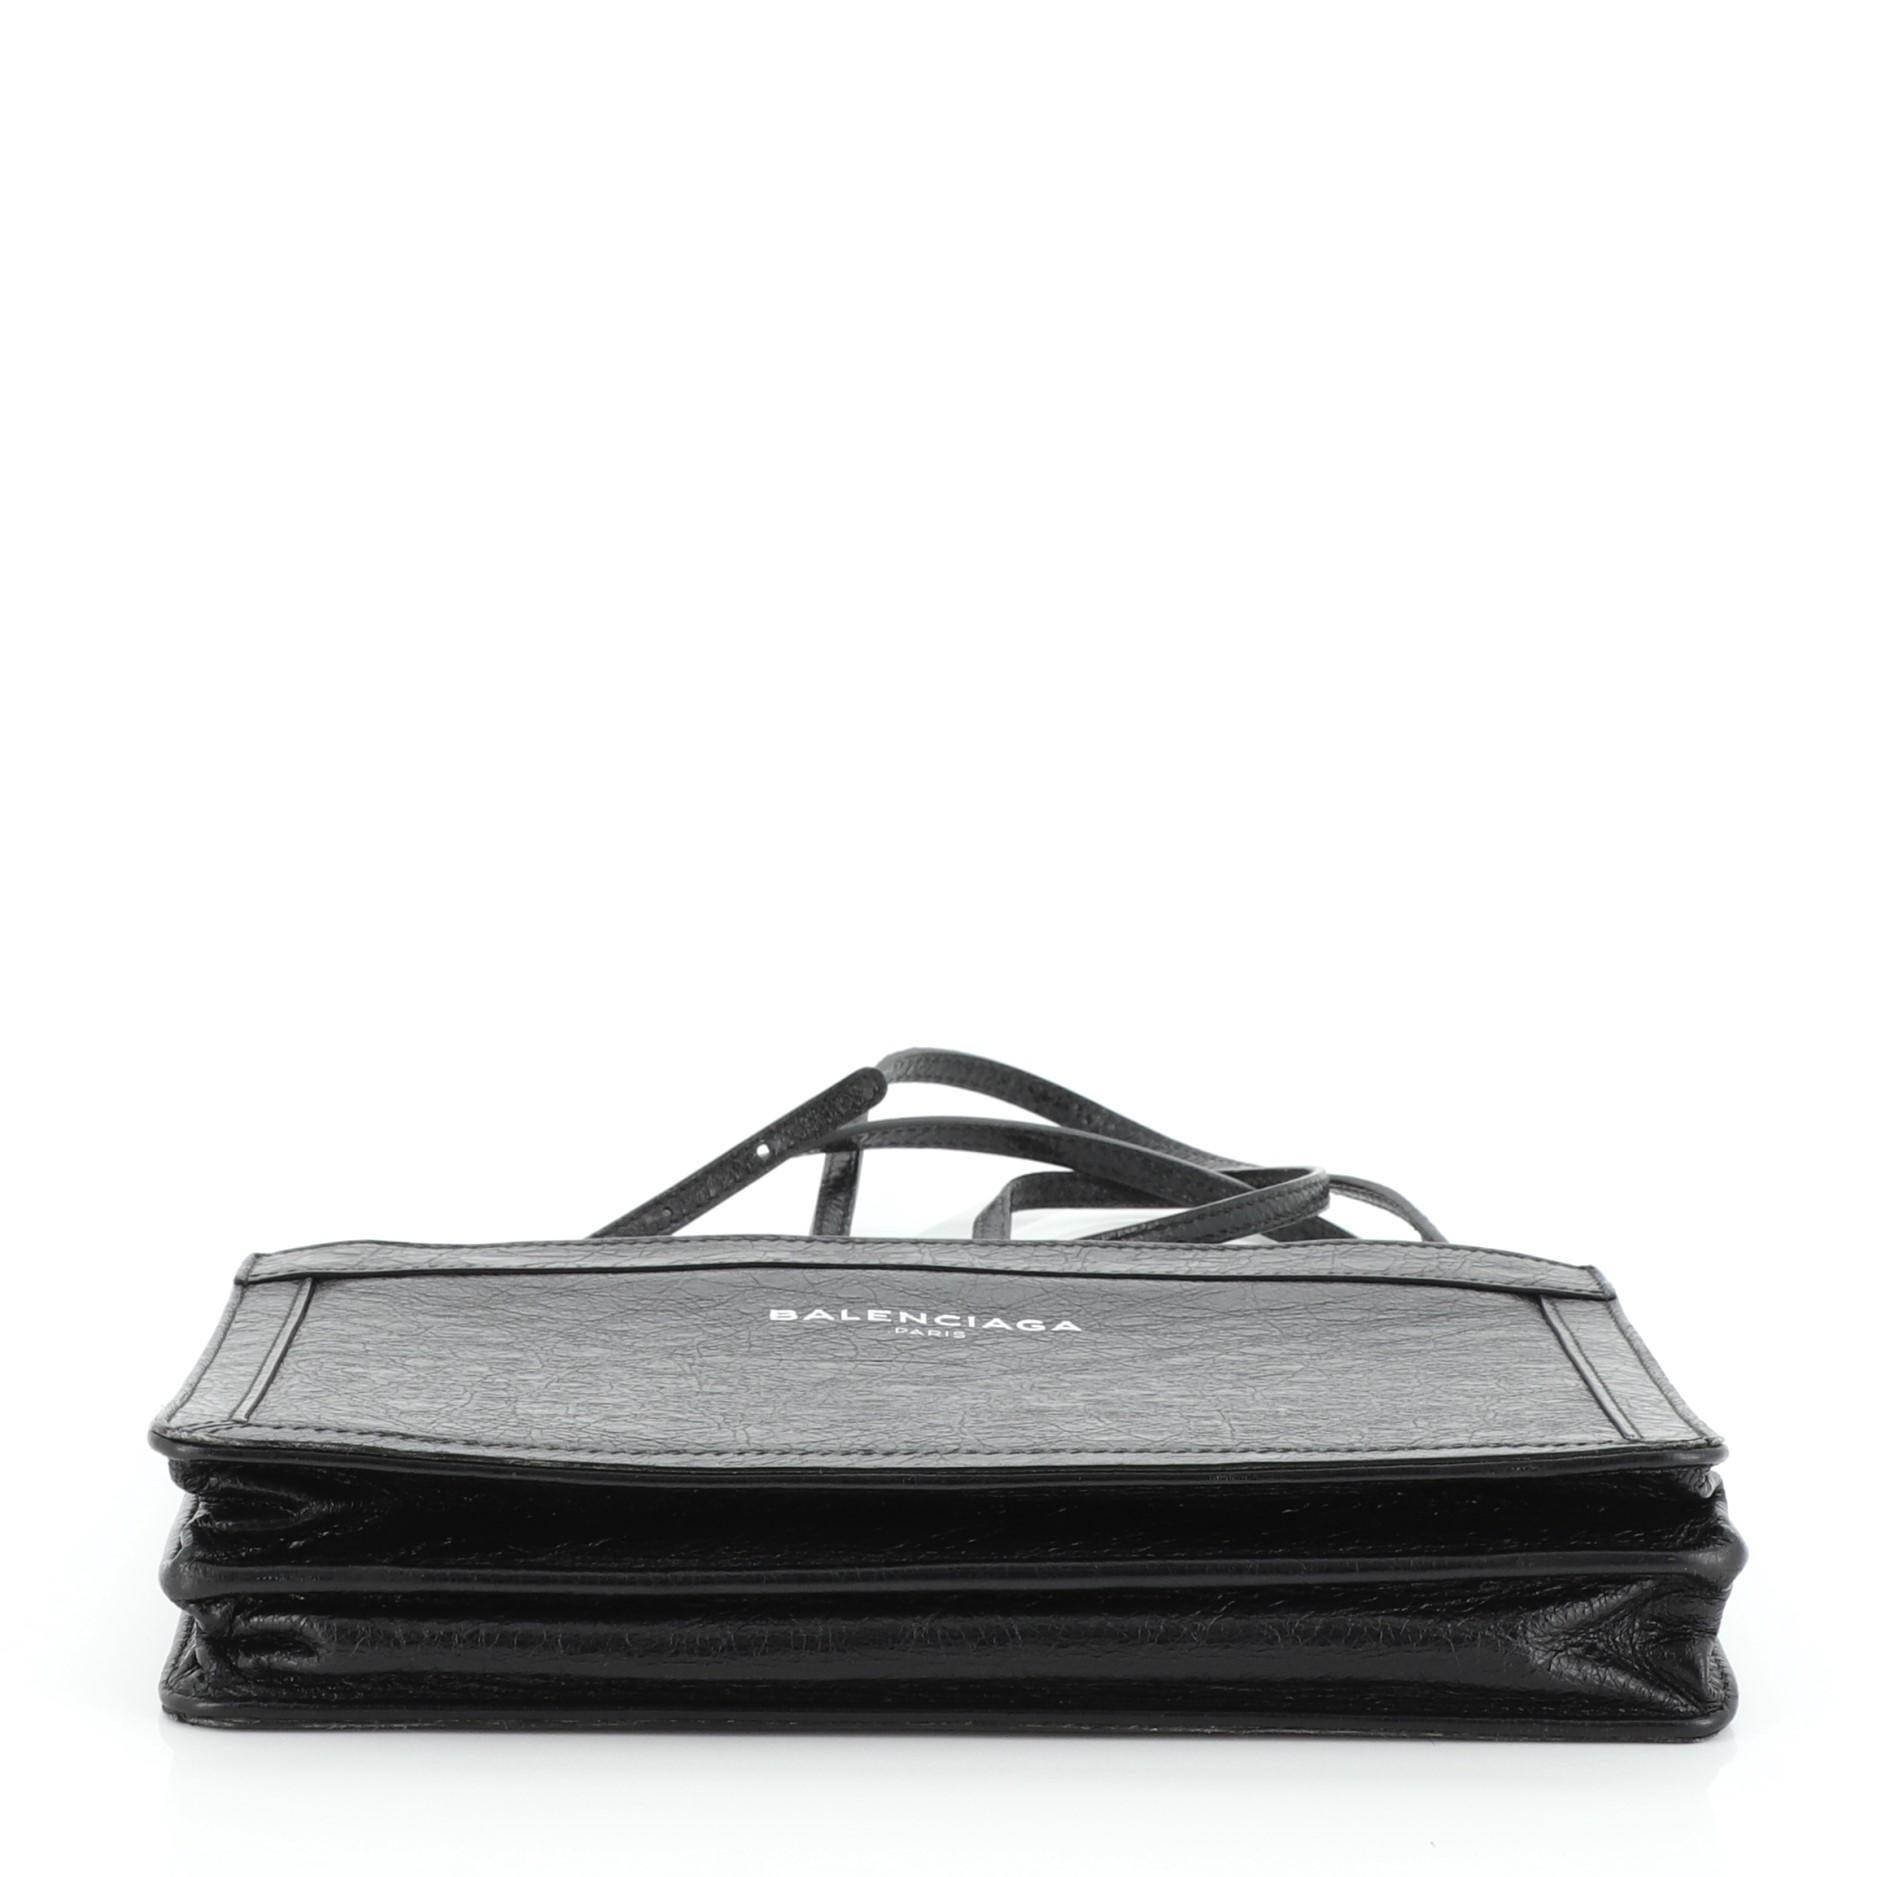 Balenciaga Navy Pochette S Leather at